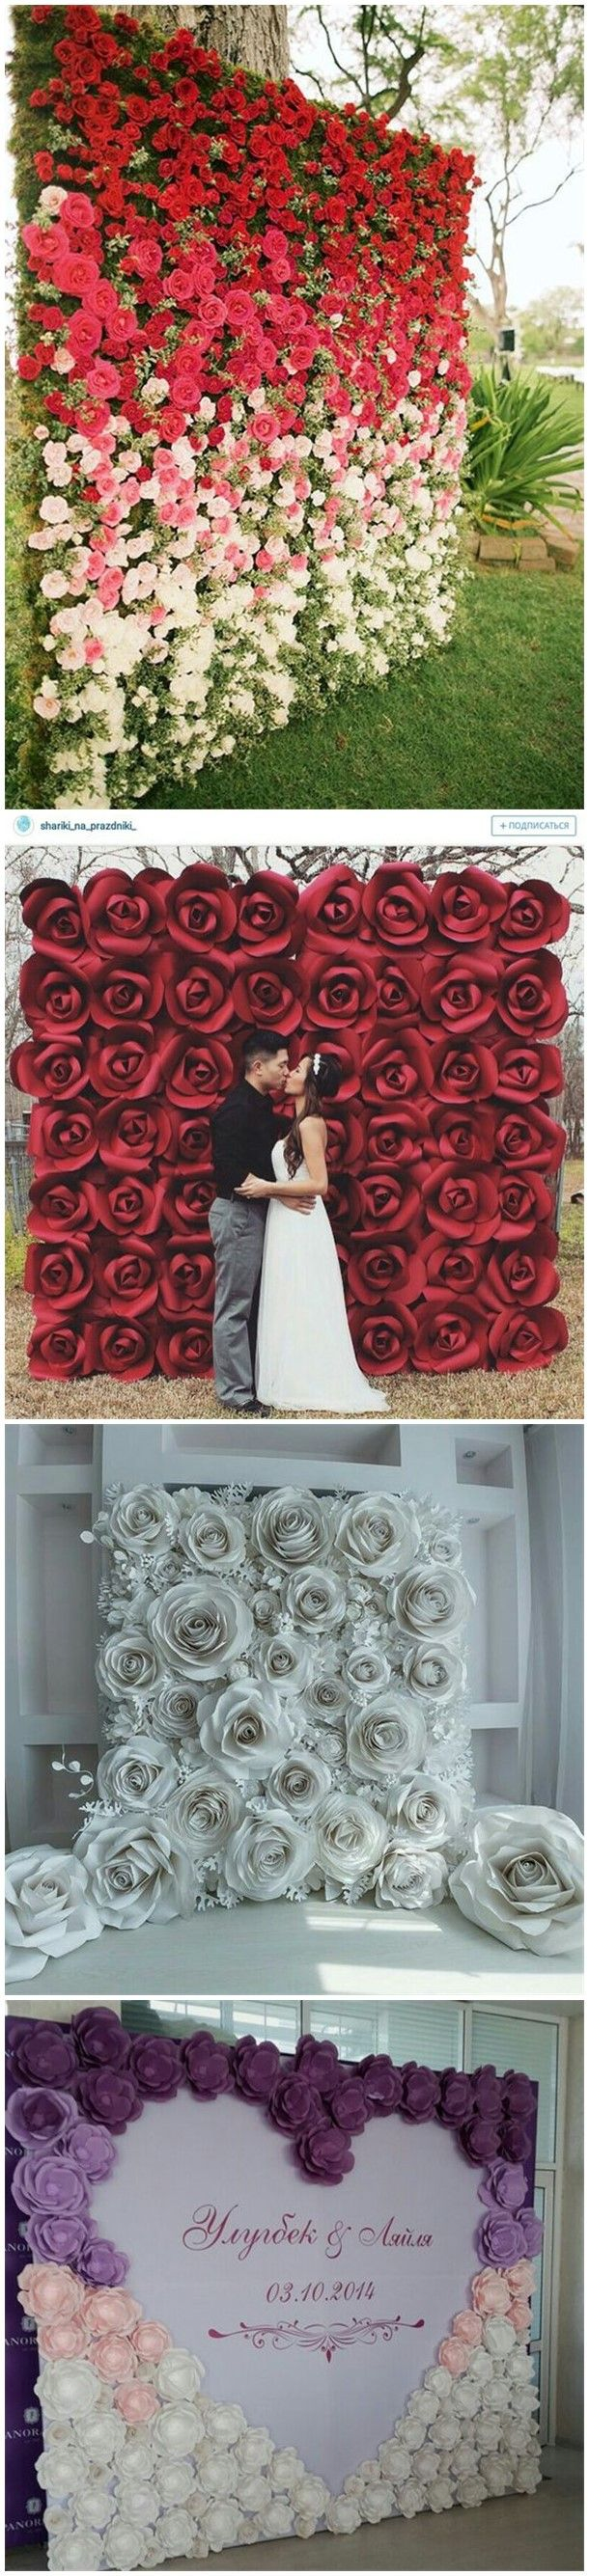 30 Unique and Breathtaking Wedding Backdrop Ideas | Pinterest ...